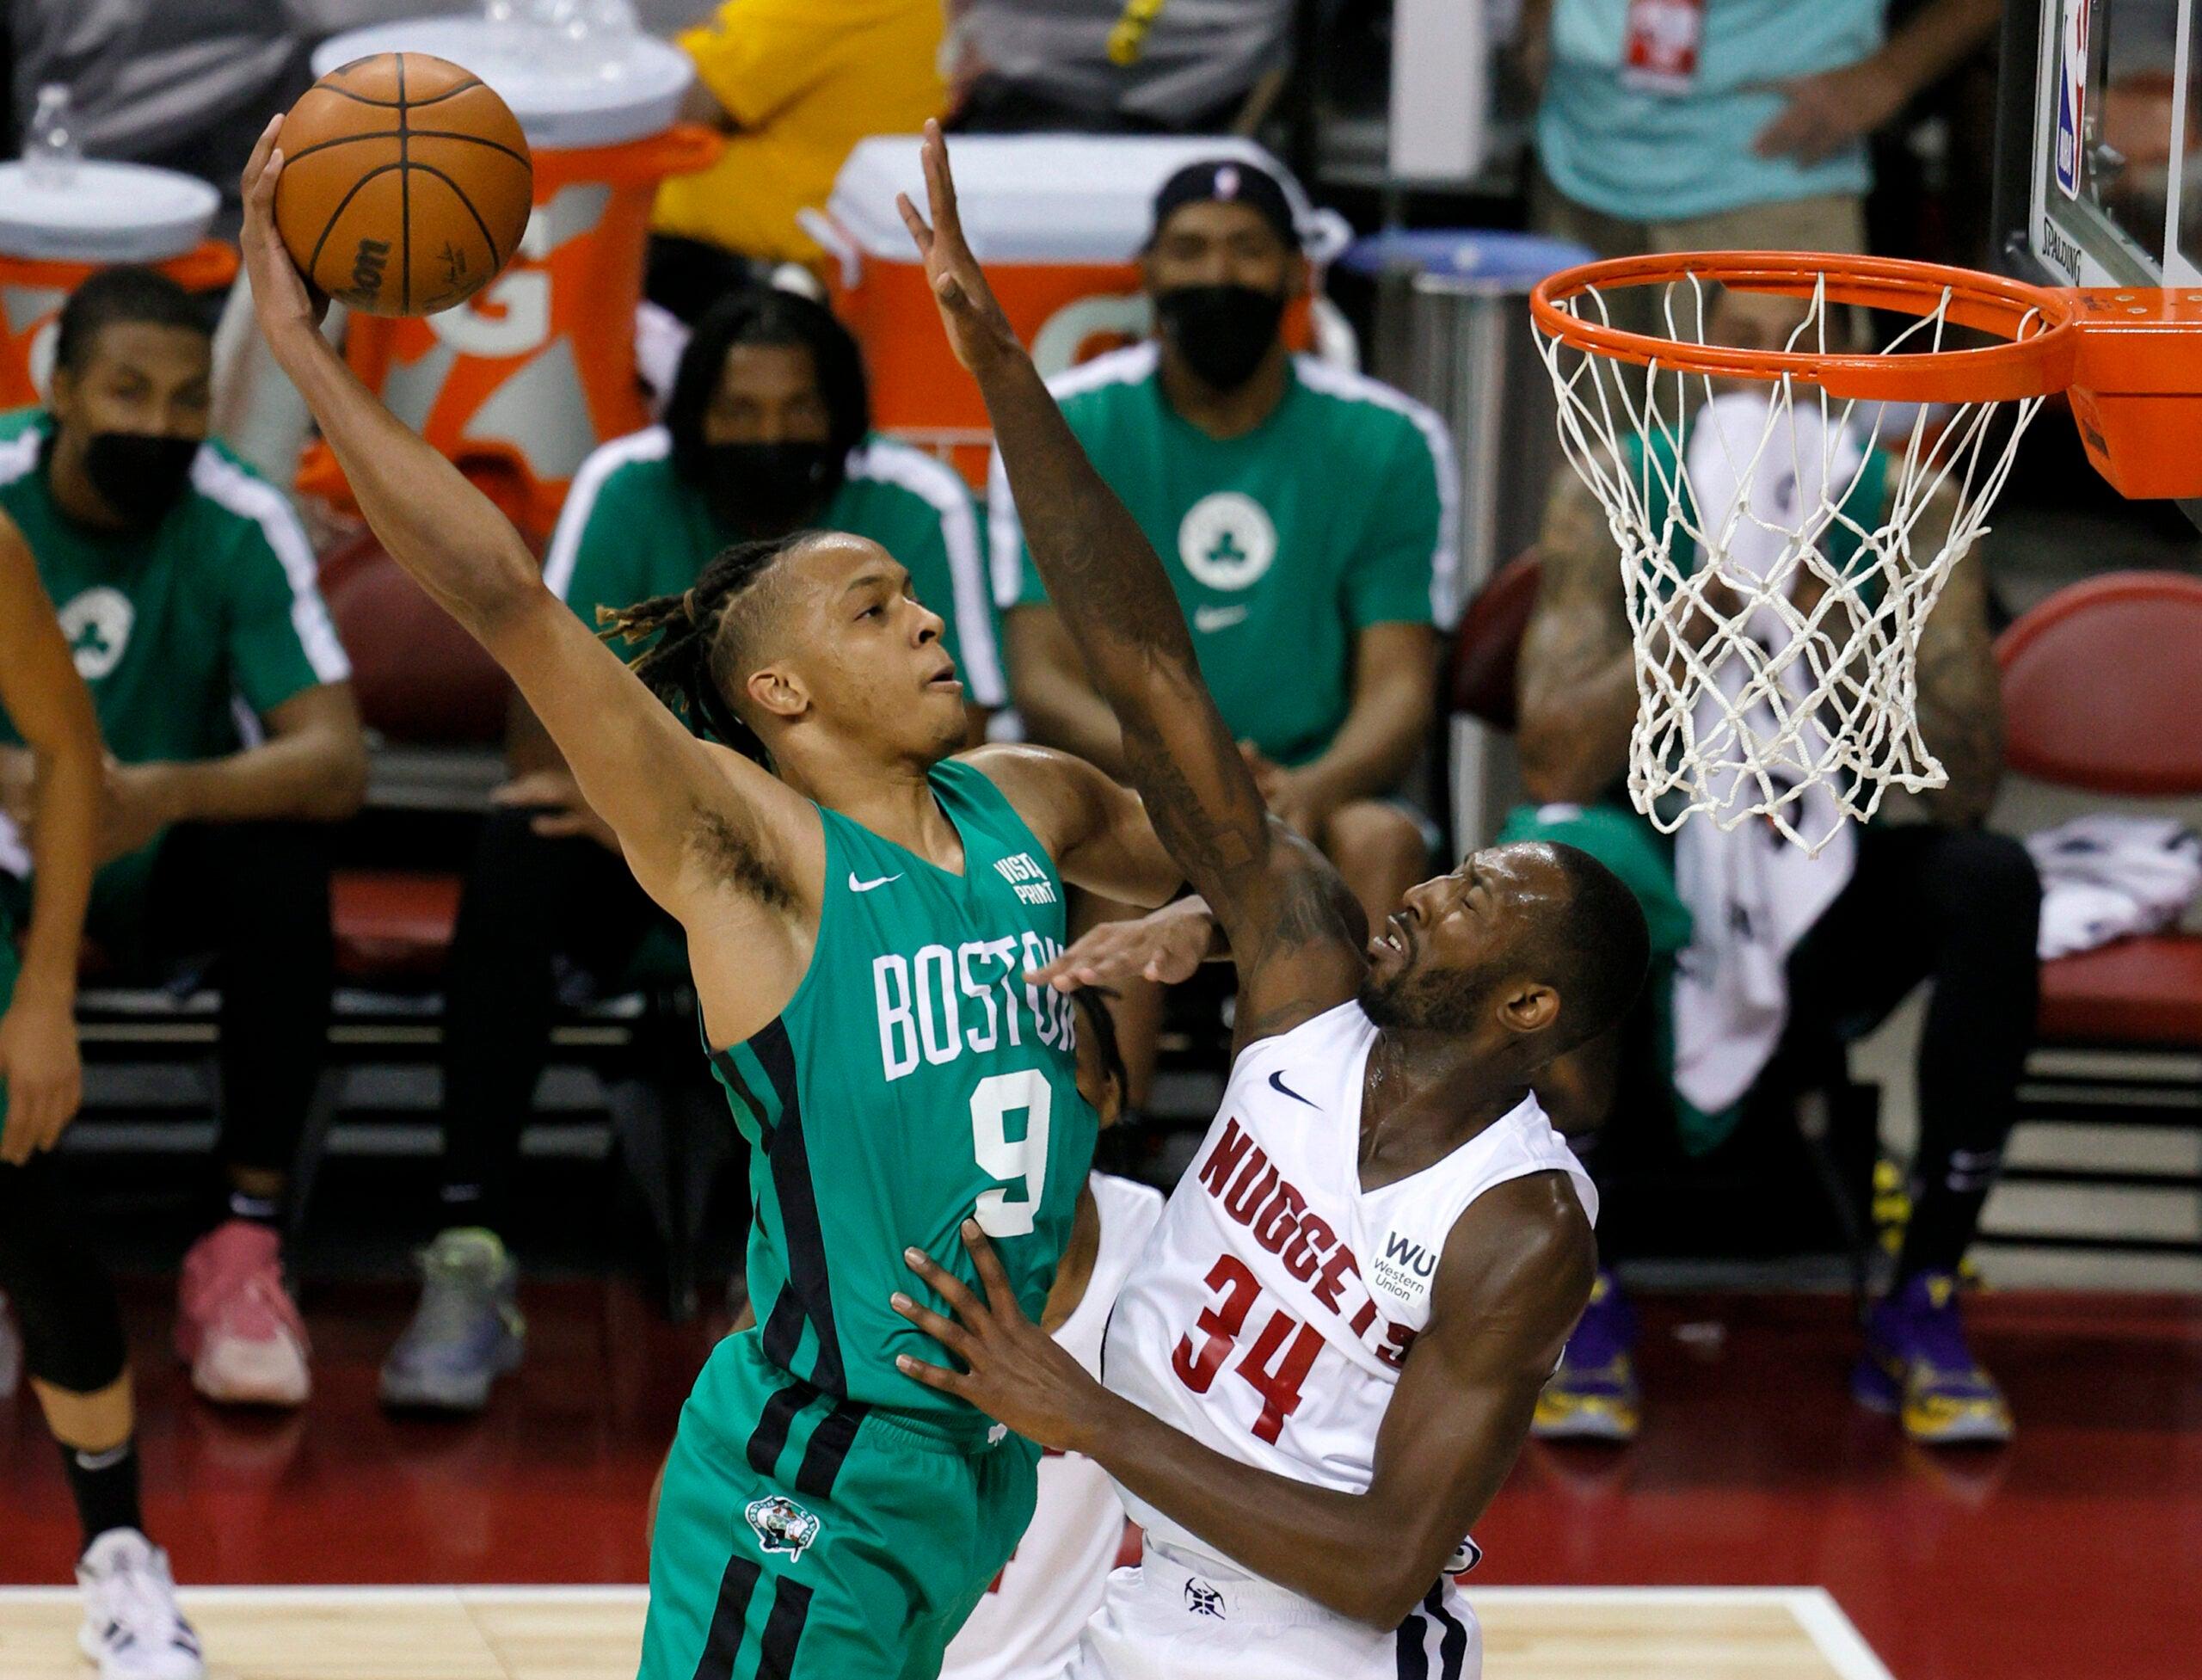 5 takeaways as Aaron Nesmith explodes in comfortable Celtics Summer League win - Boston.com